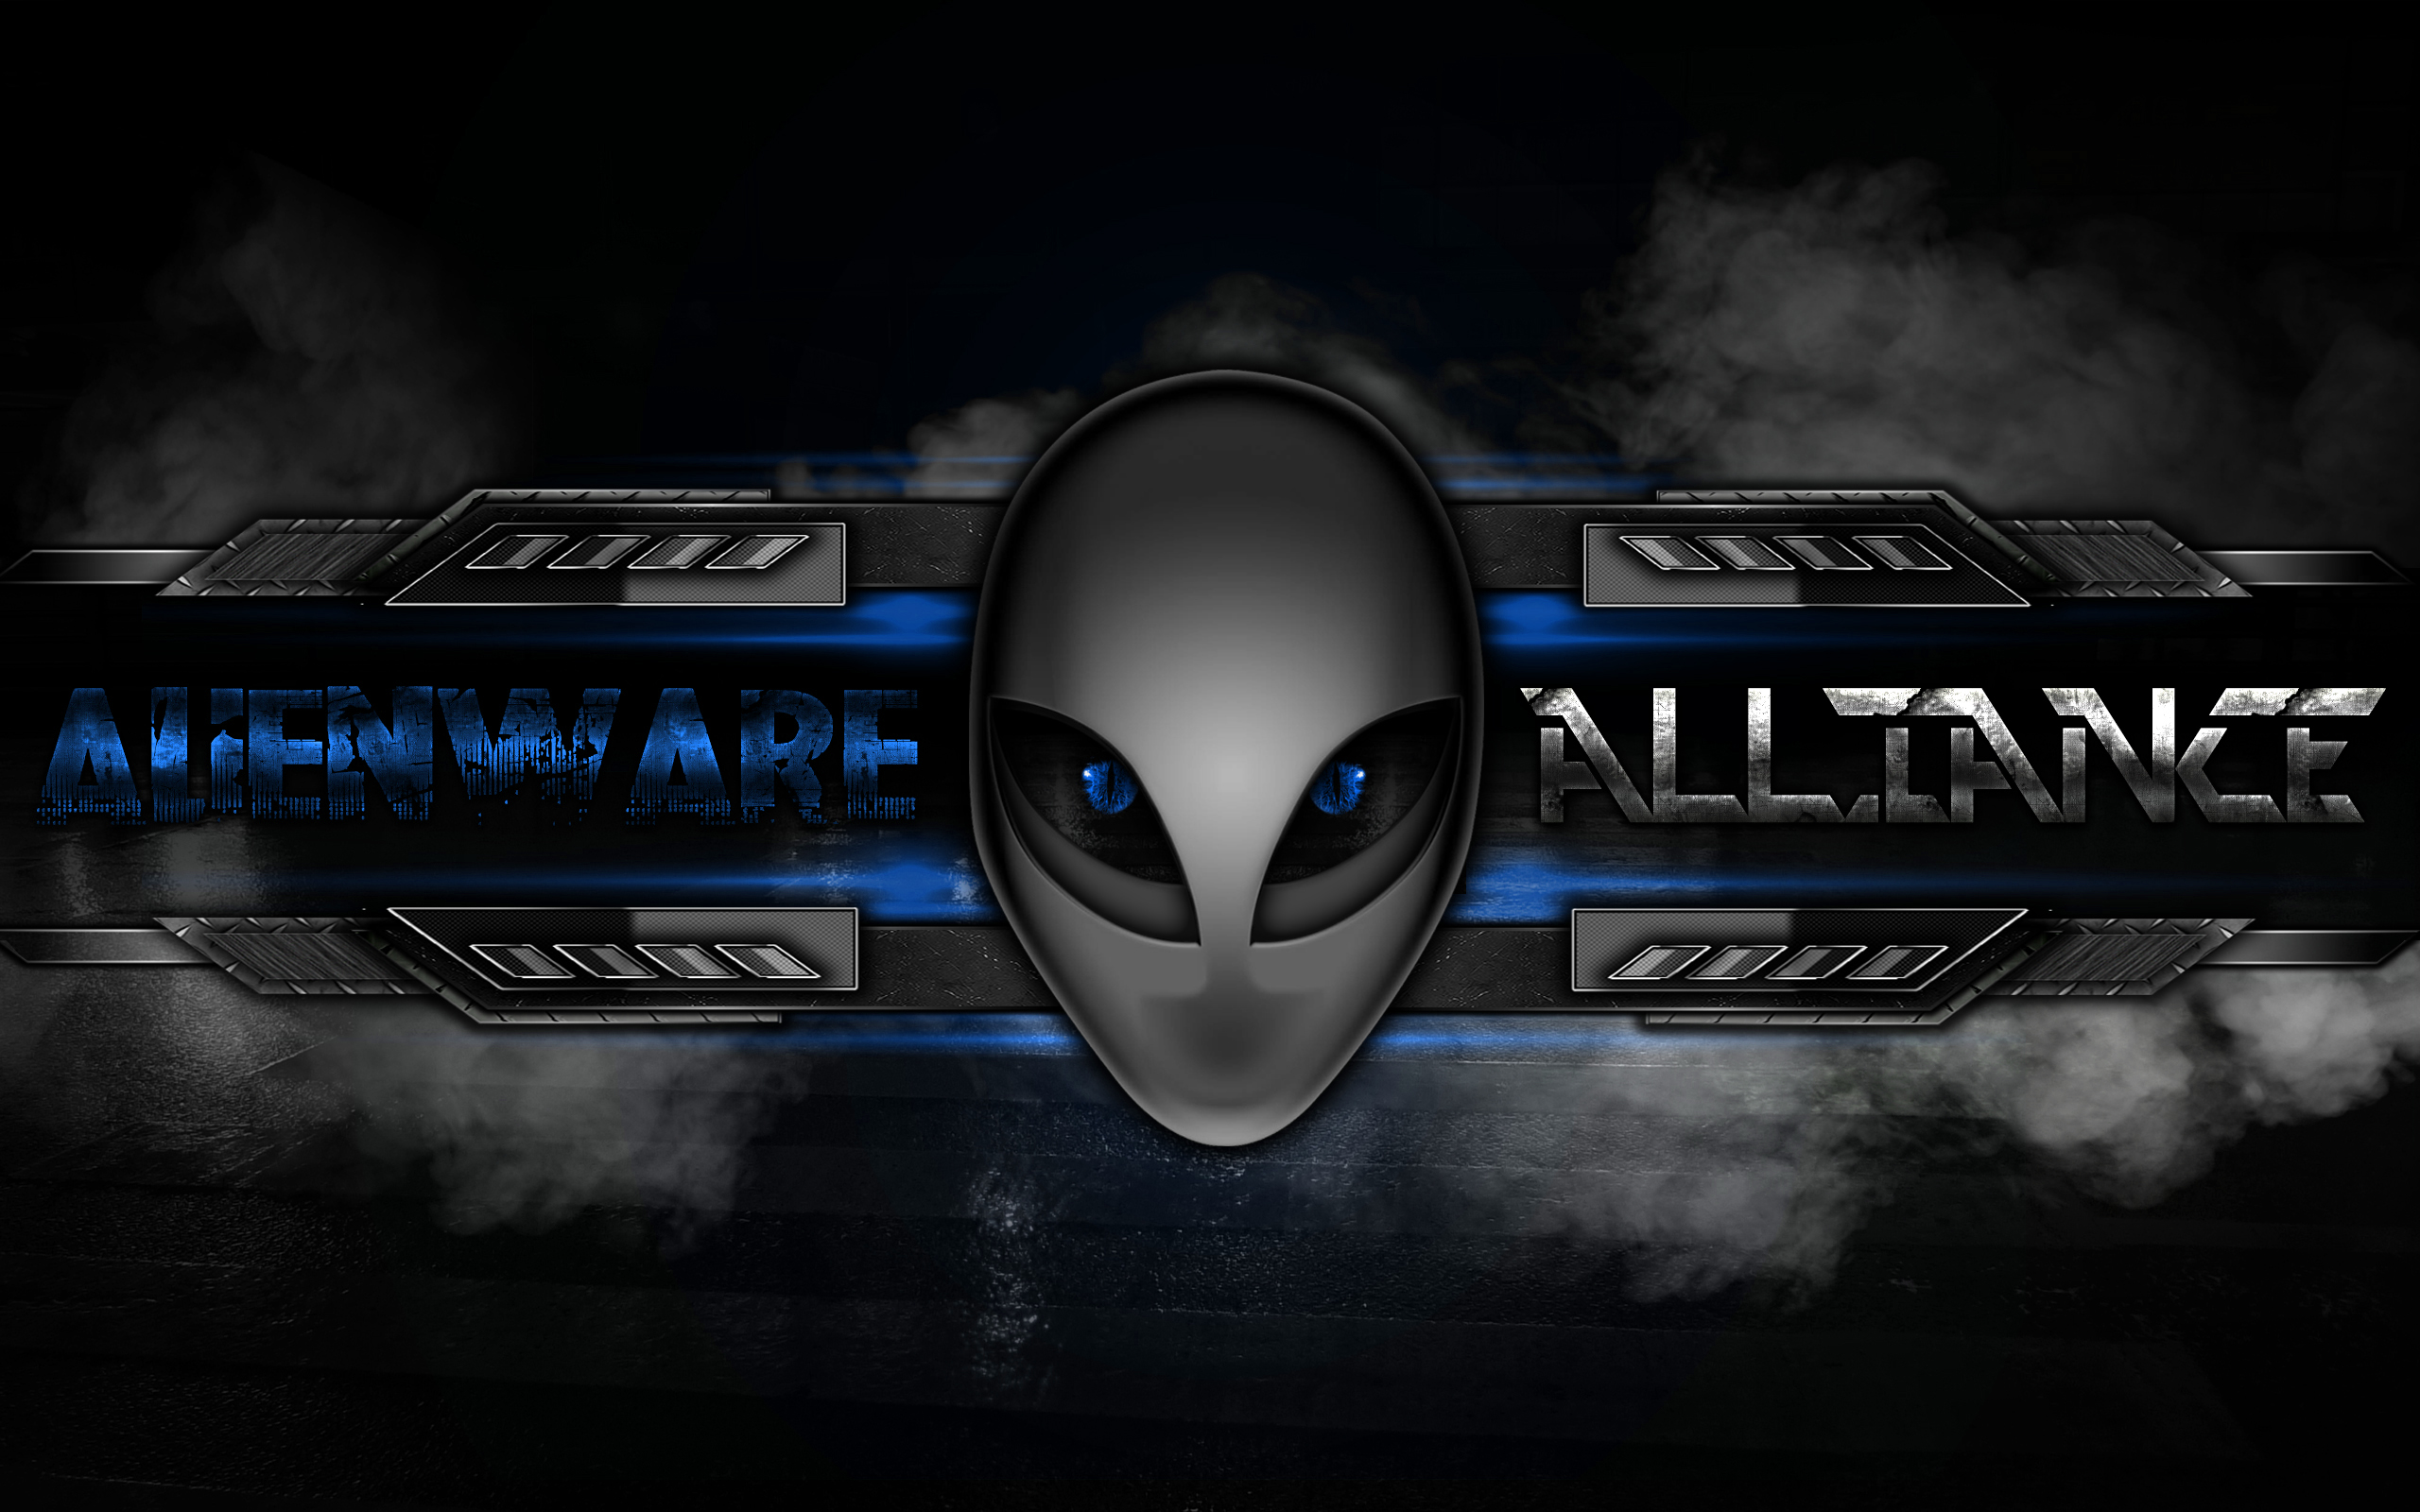 HD Alienware Wallpapers 19201080 Alienware Backgrounds for Laptops 2560x1600